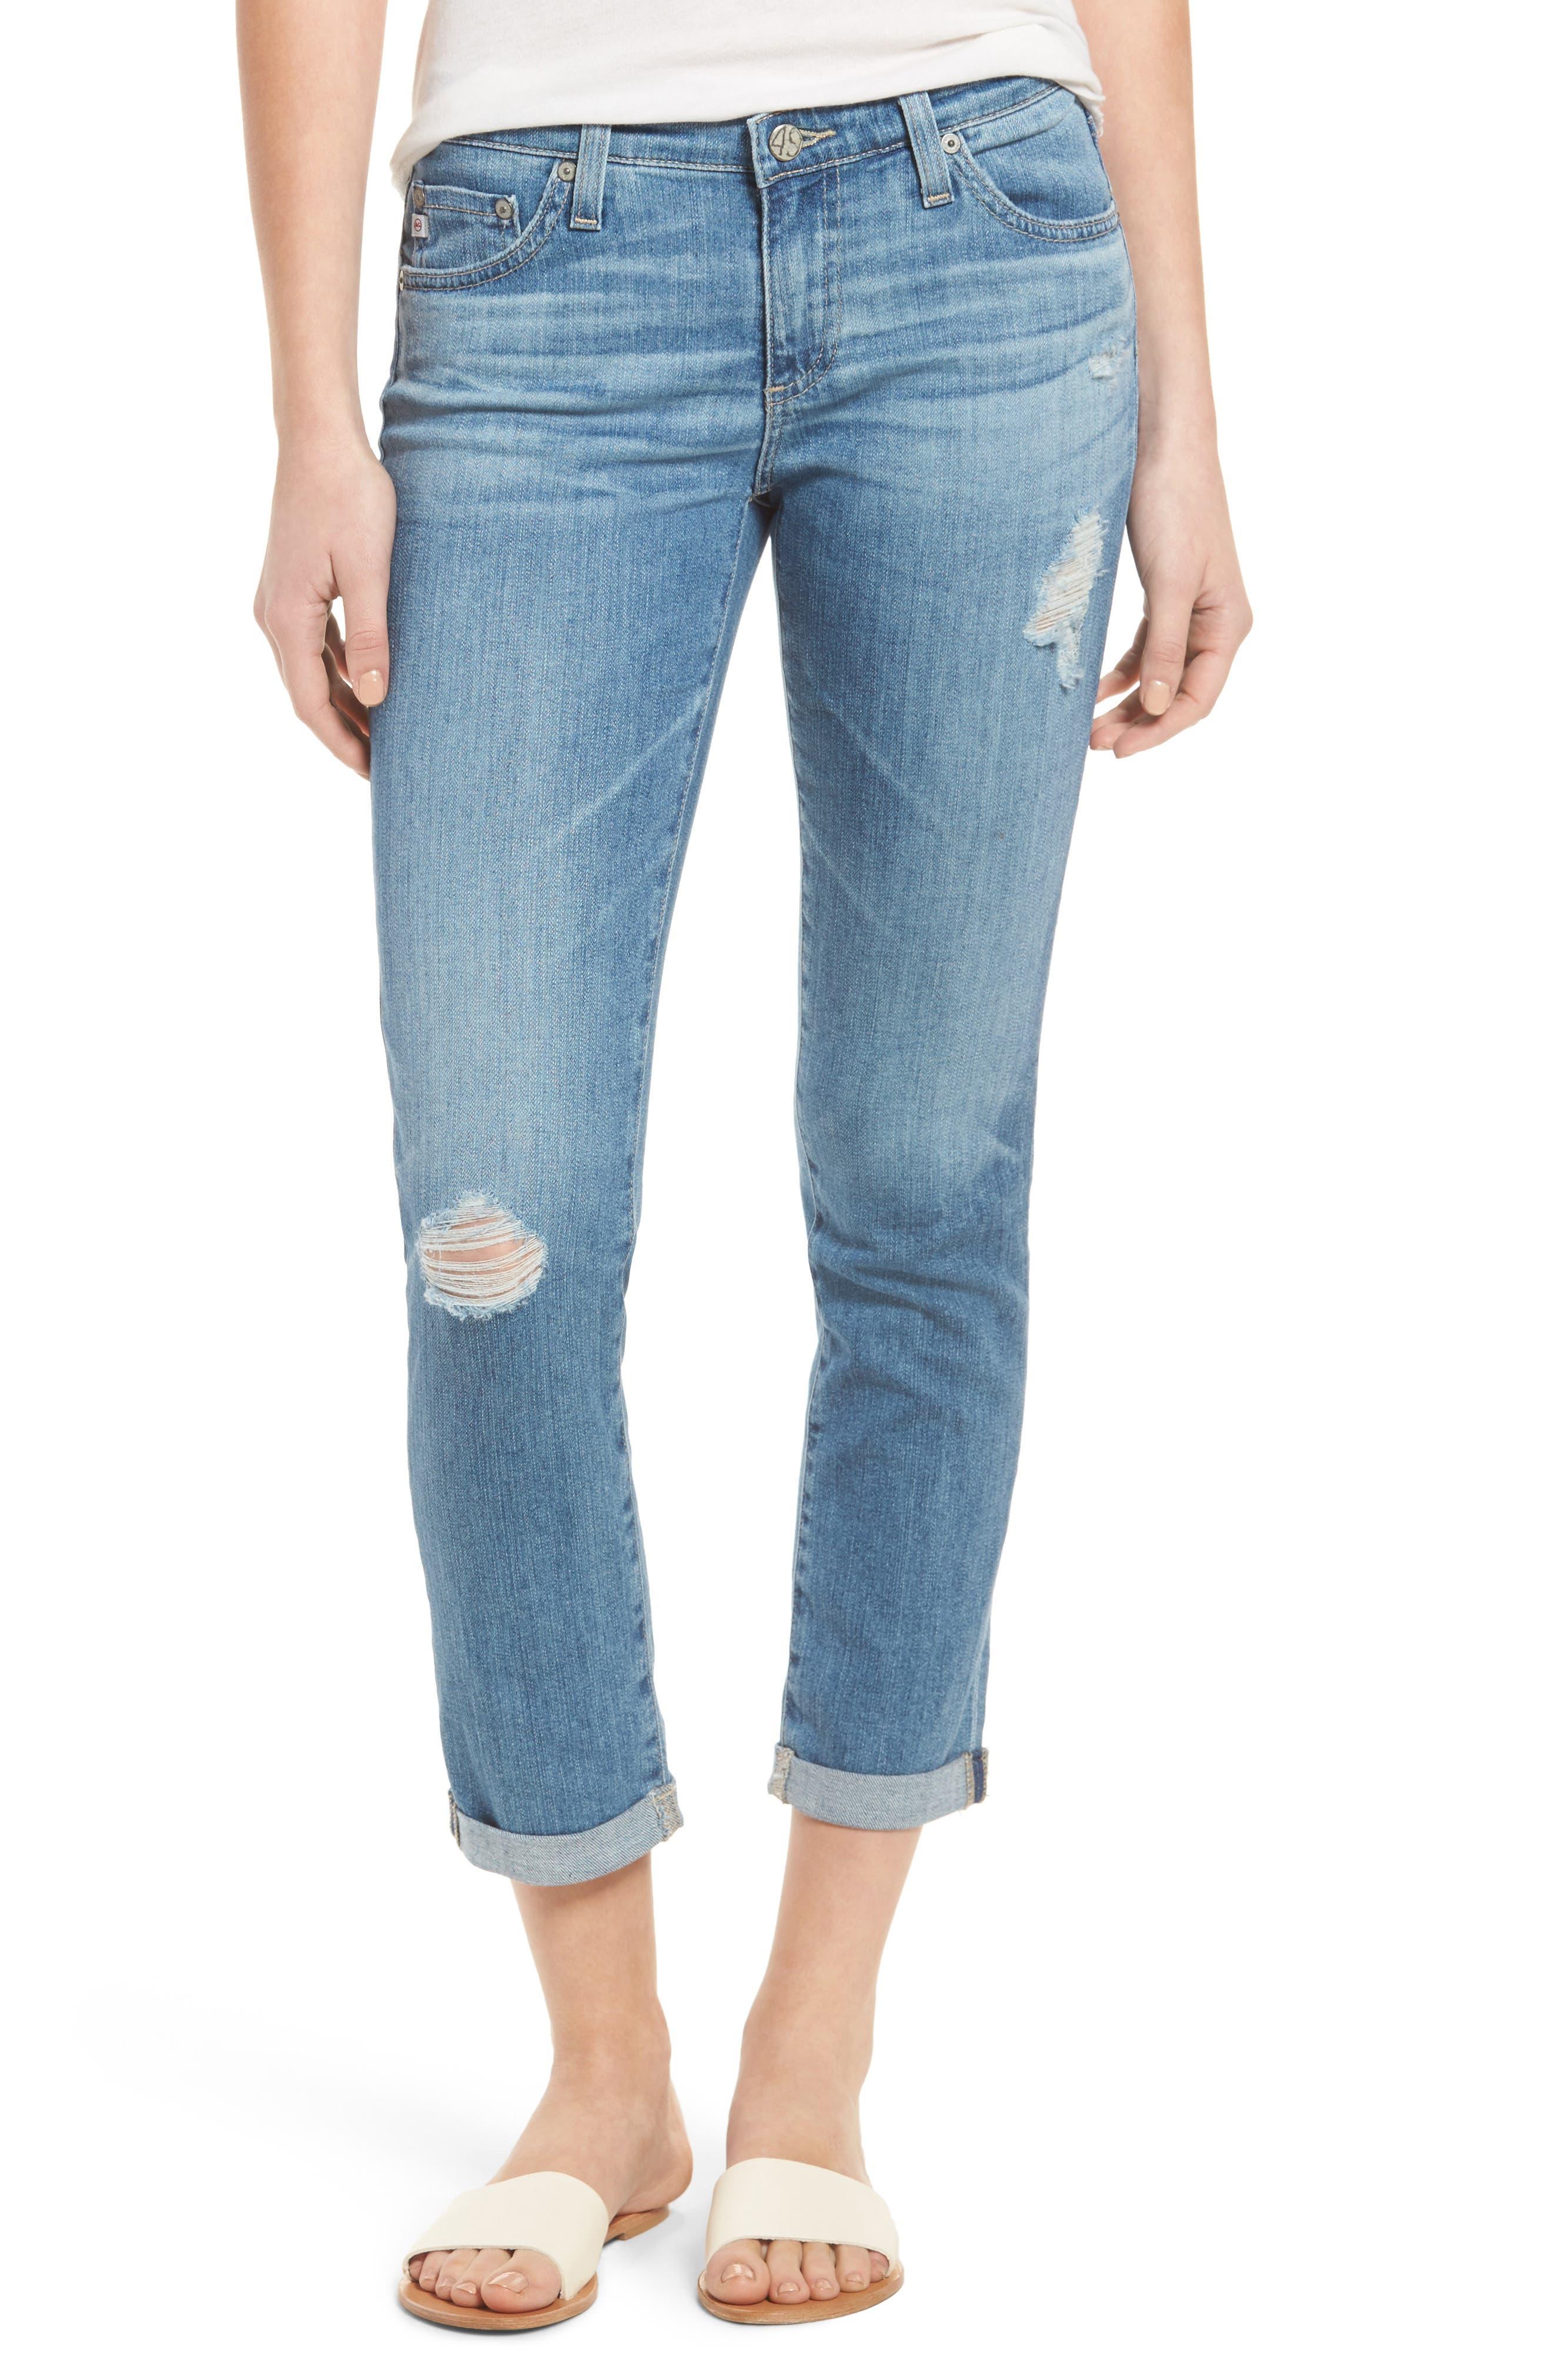 AG 'Stilt' Distressed Roll Cuff Cigarette Jeans, Main, color, 403